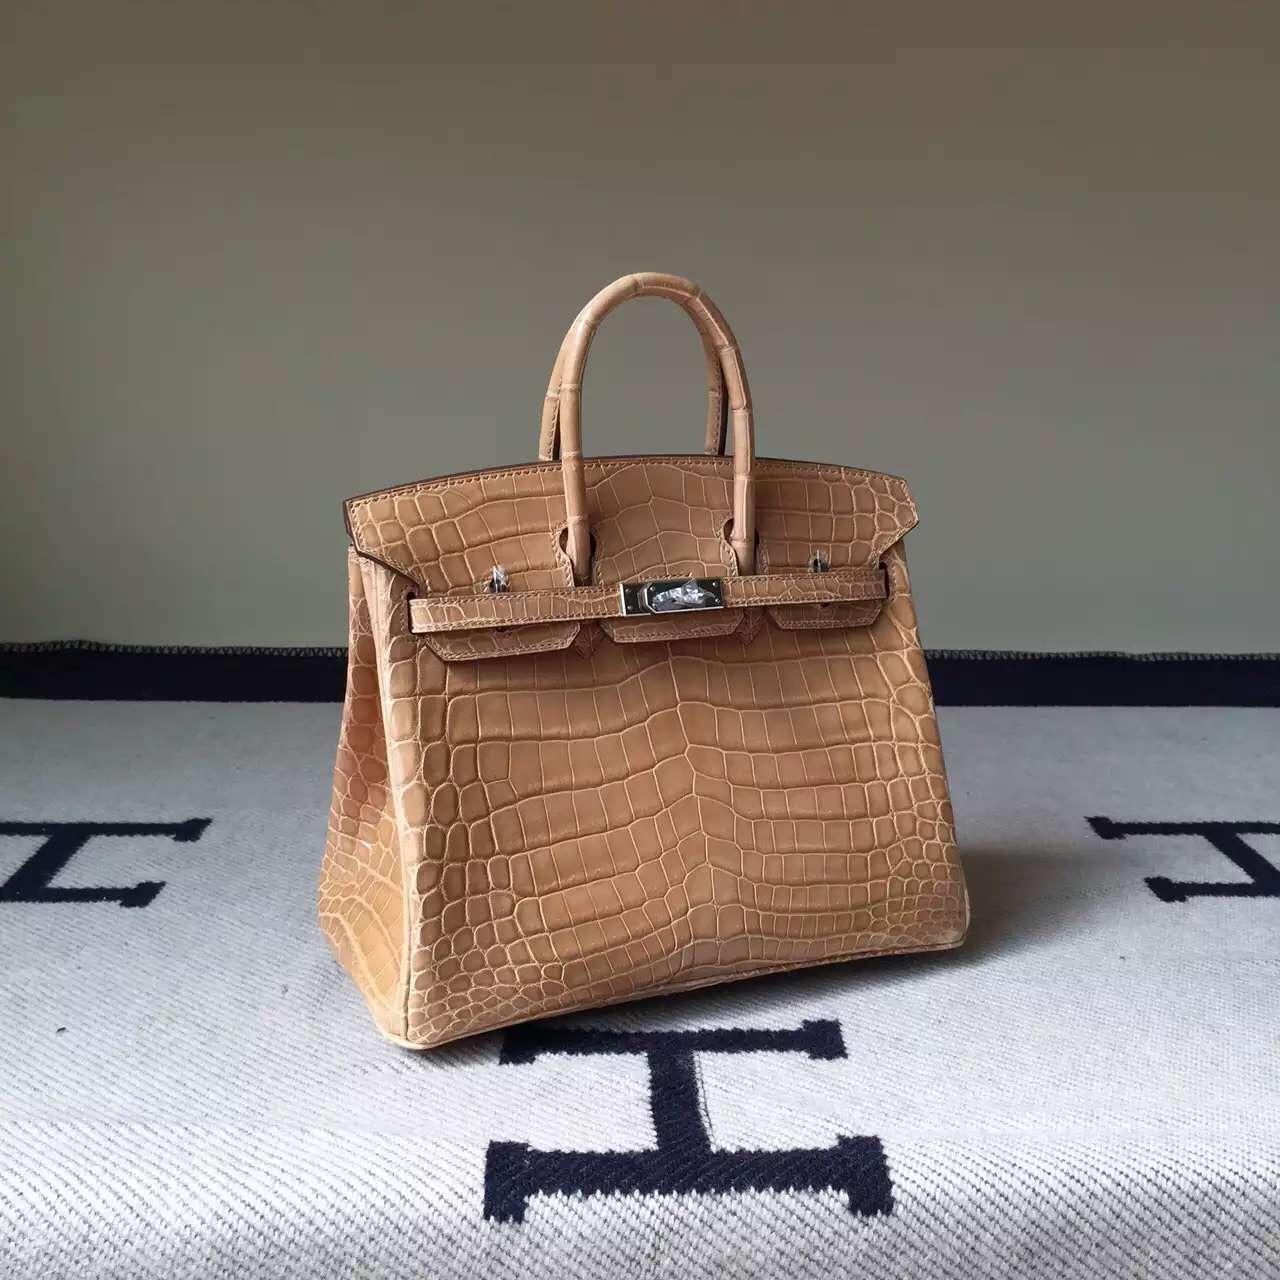 New Arrival Hermes Apricot Crocodile Shiny Leather Birkin Bag 25cm